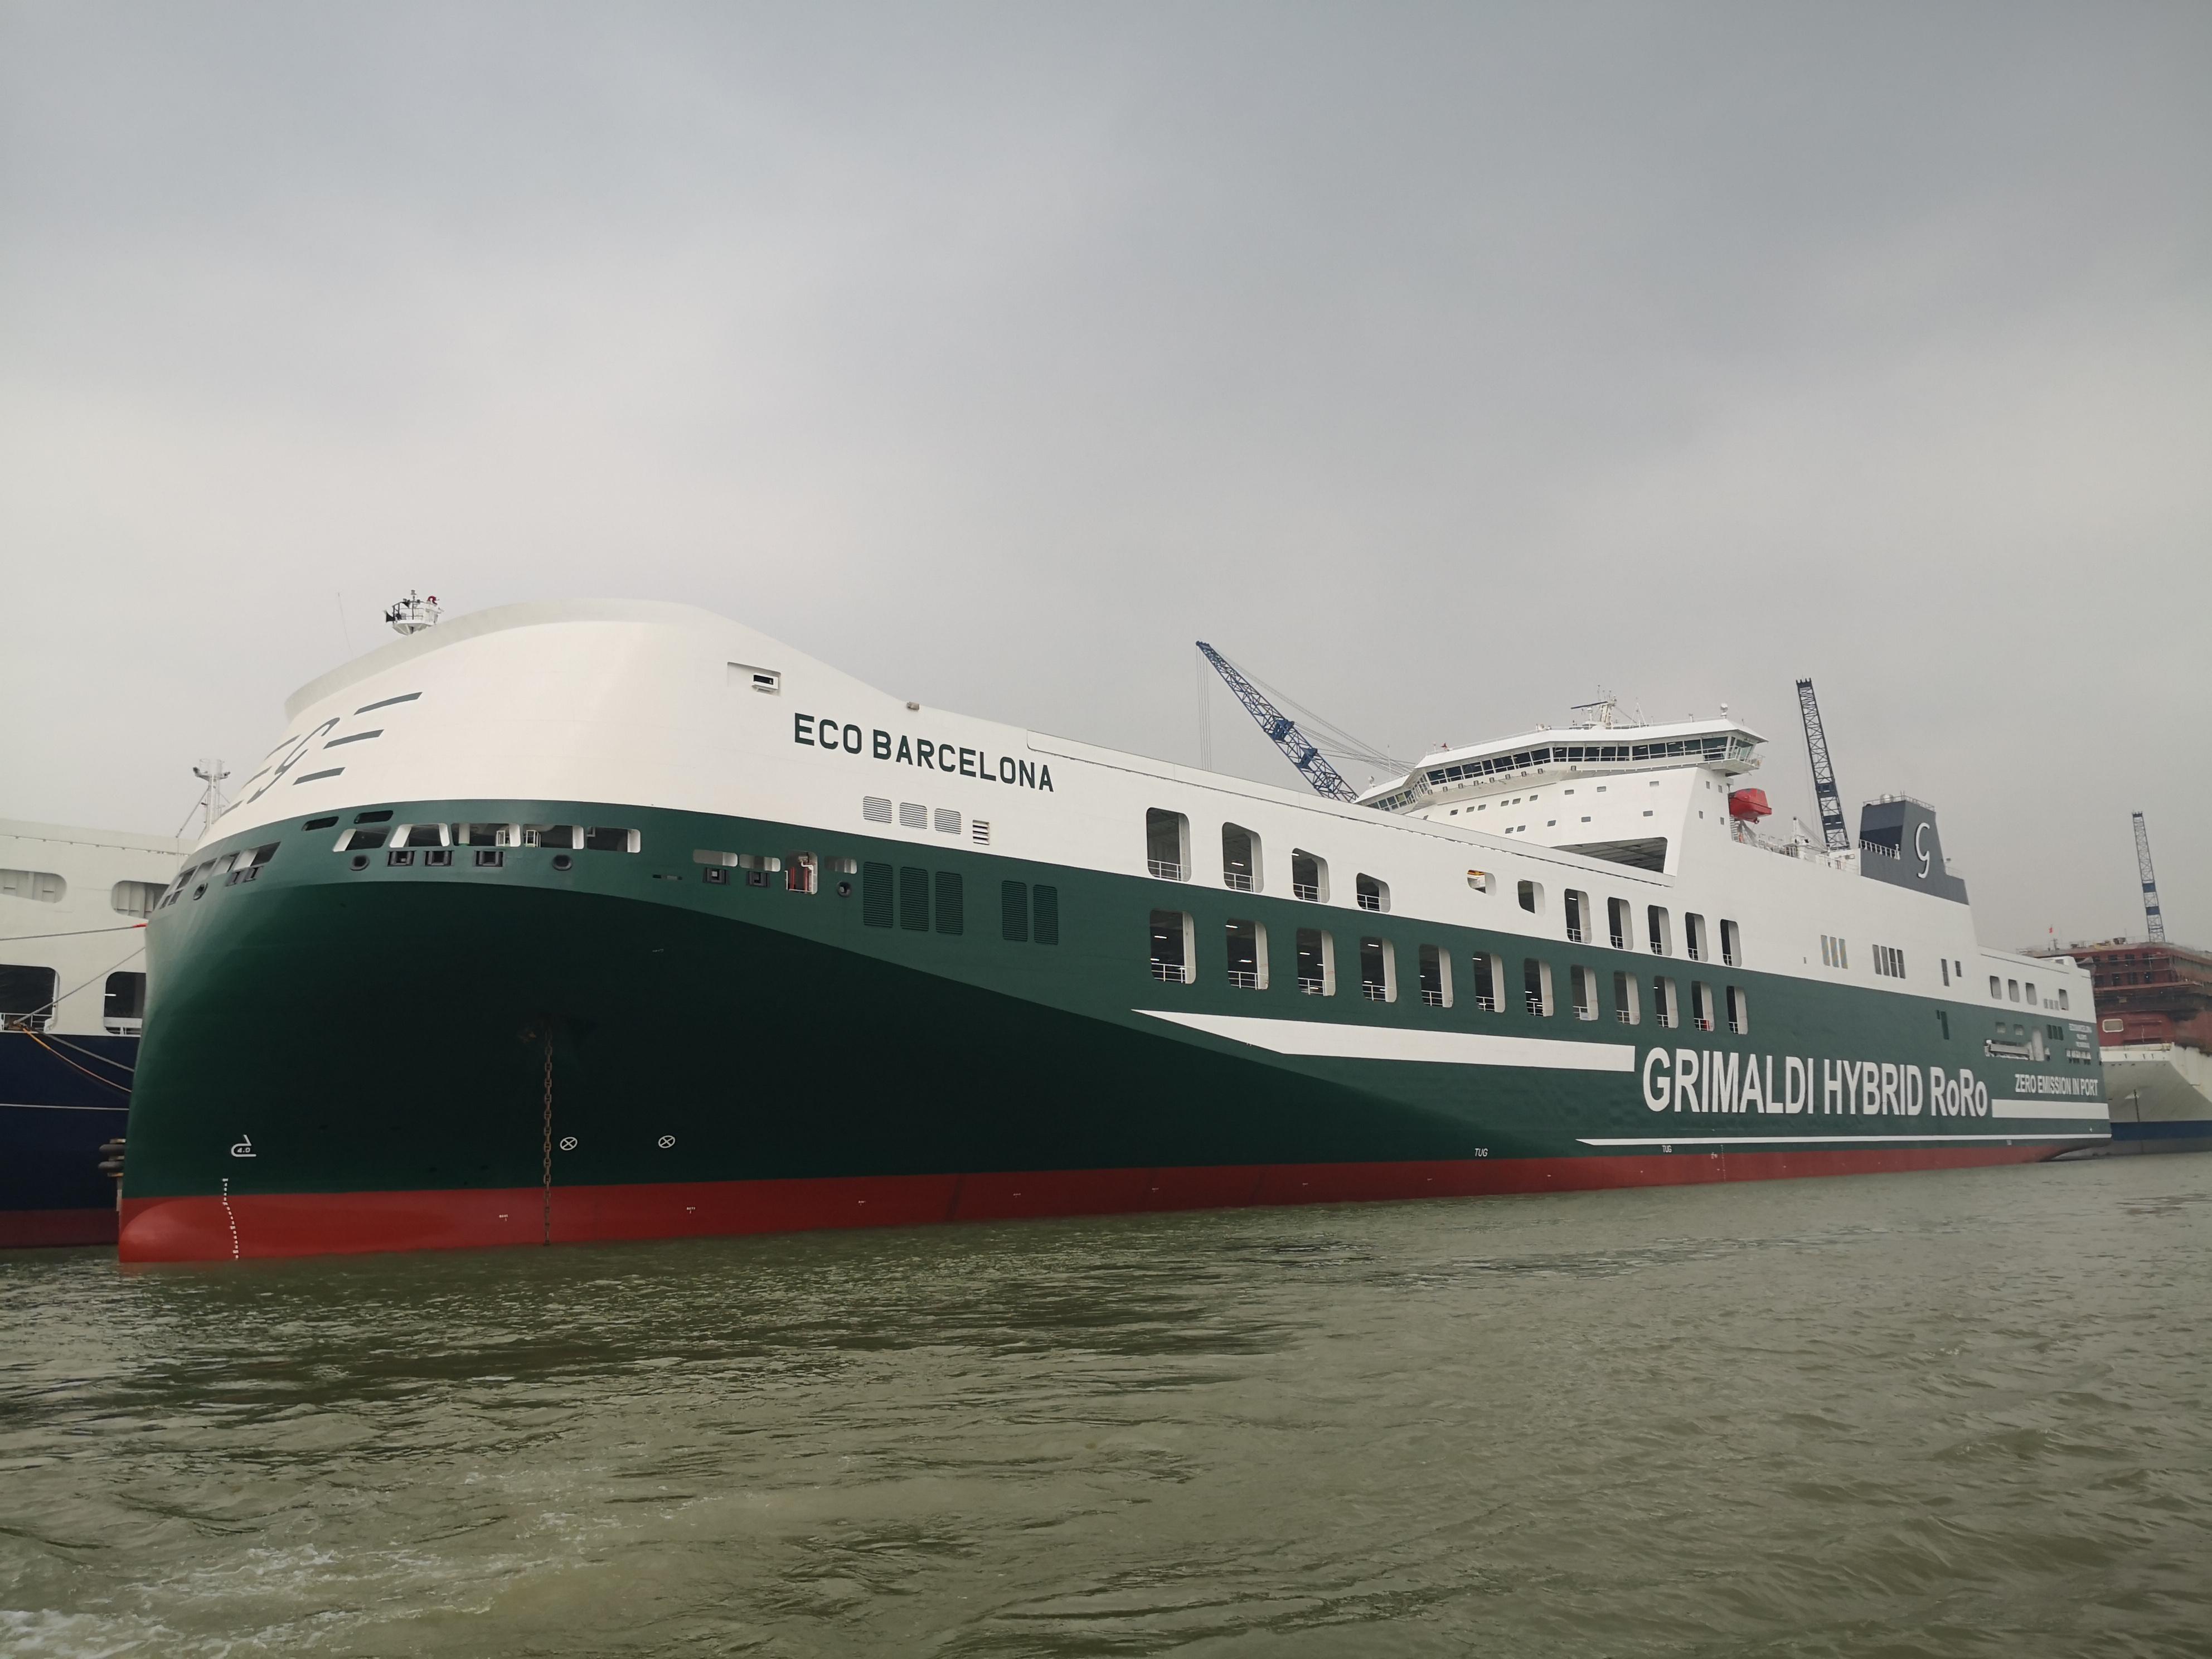 Grimaldi receives its 4th giant hybrid Ro-Ro ship